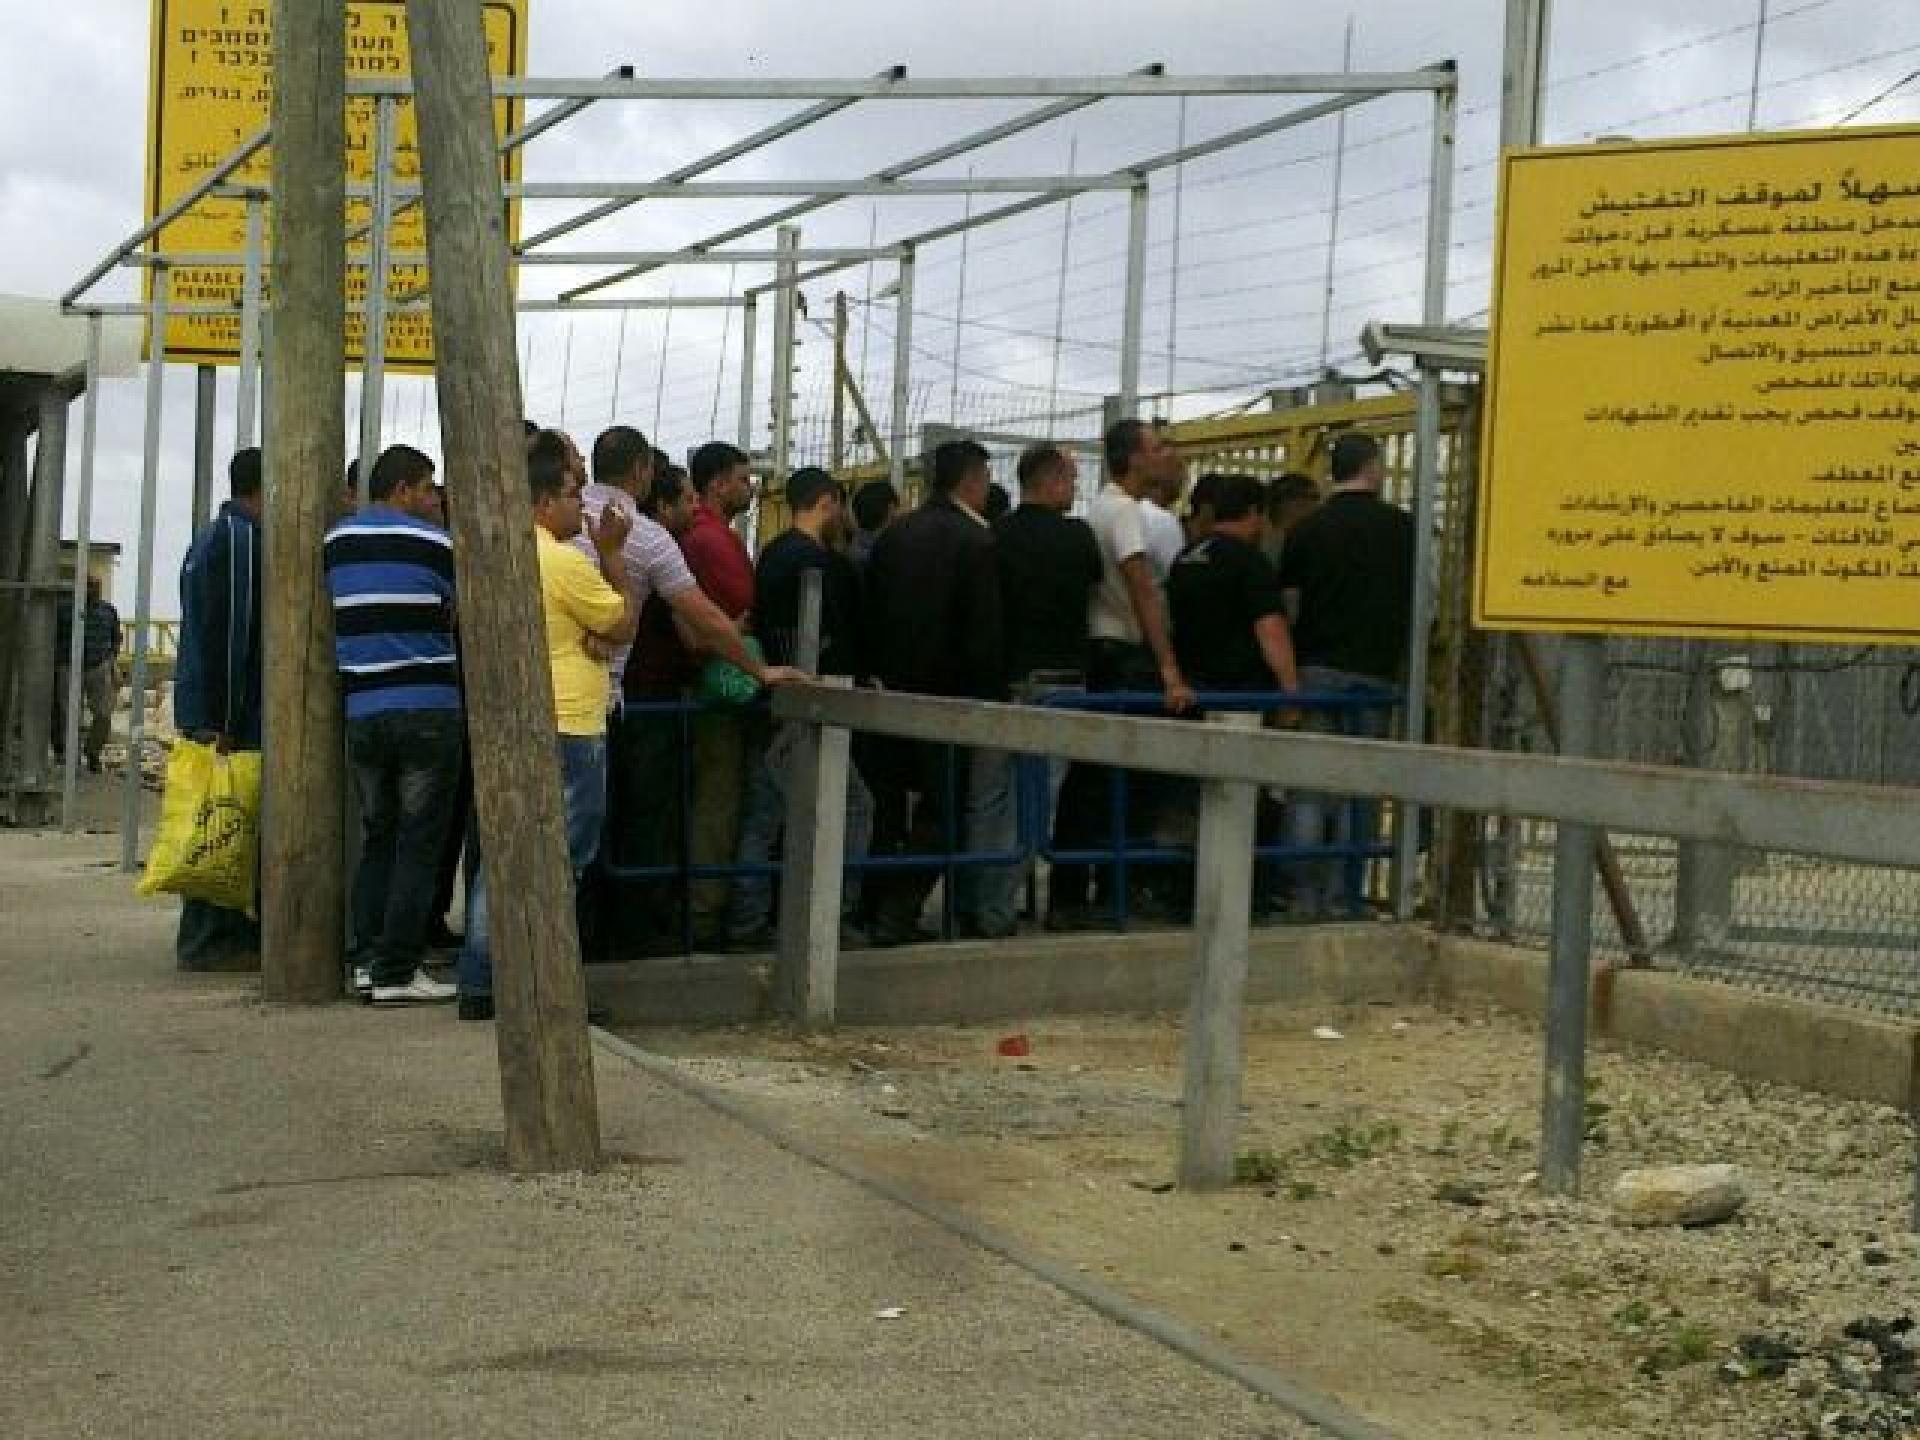 Barta'a/Reikhan checkpoint 19.04.12